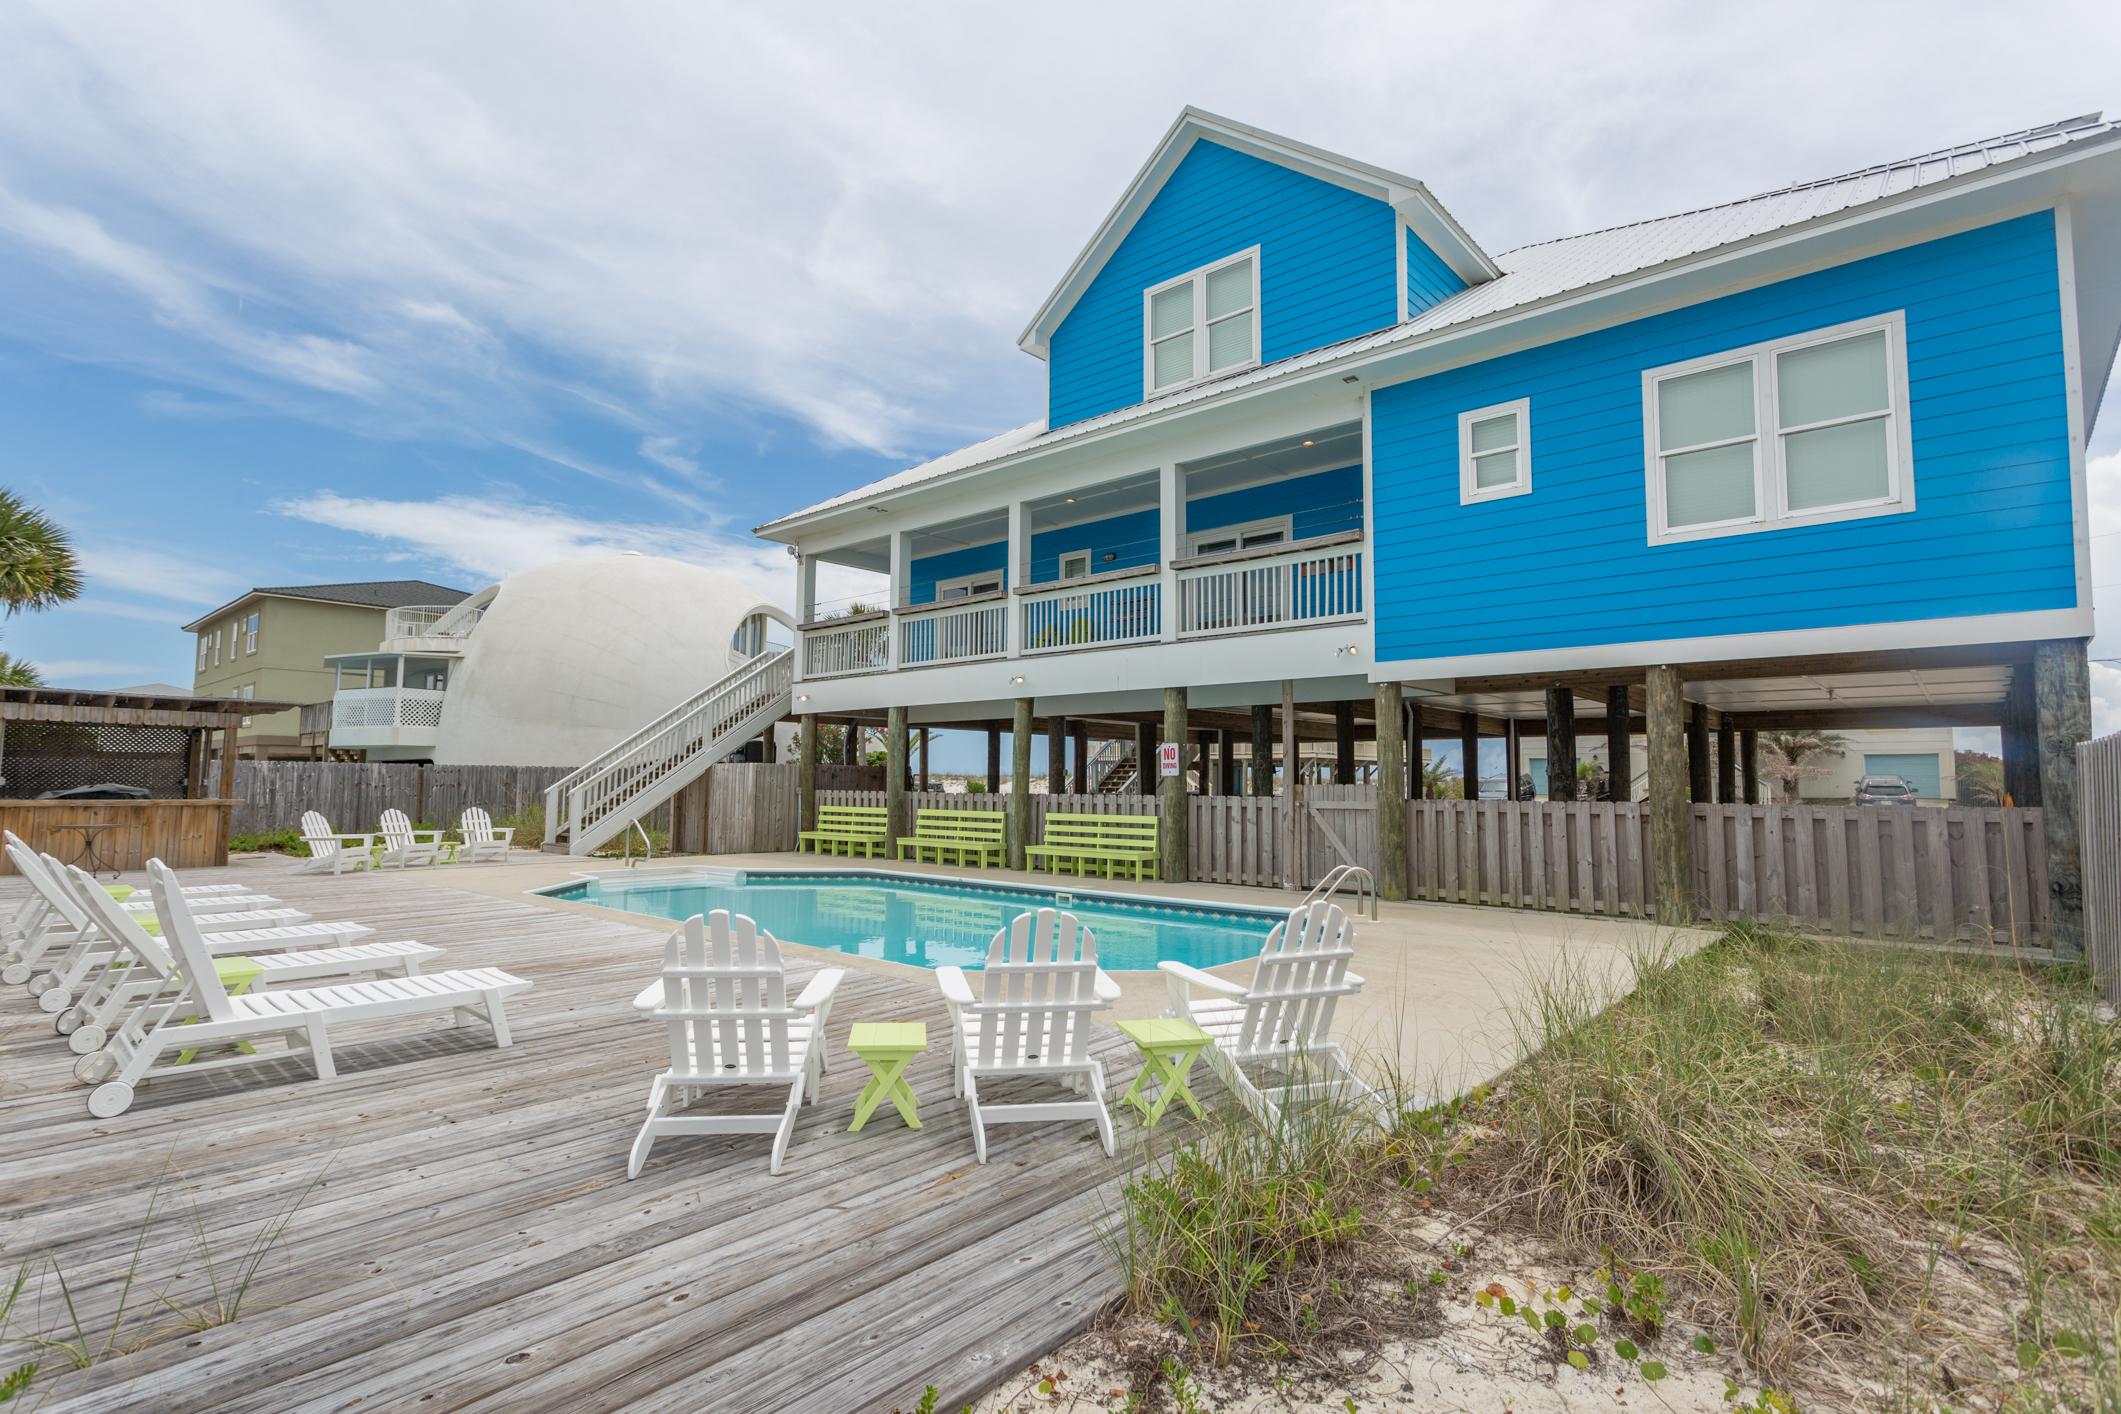 Ariola 1003 - The Starfish House House/Cottage rental in Pensacola Beach House Rentals in Pensacola Beach Florida - #74